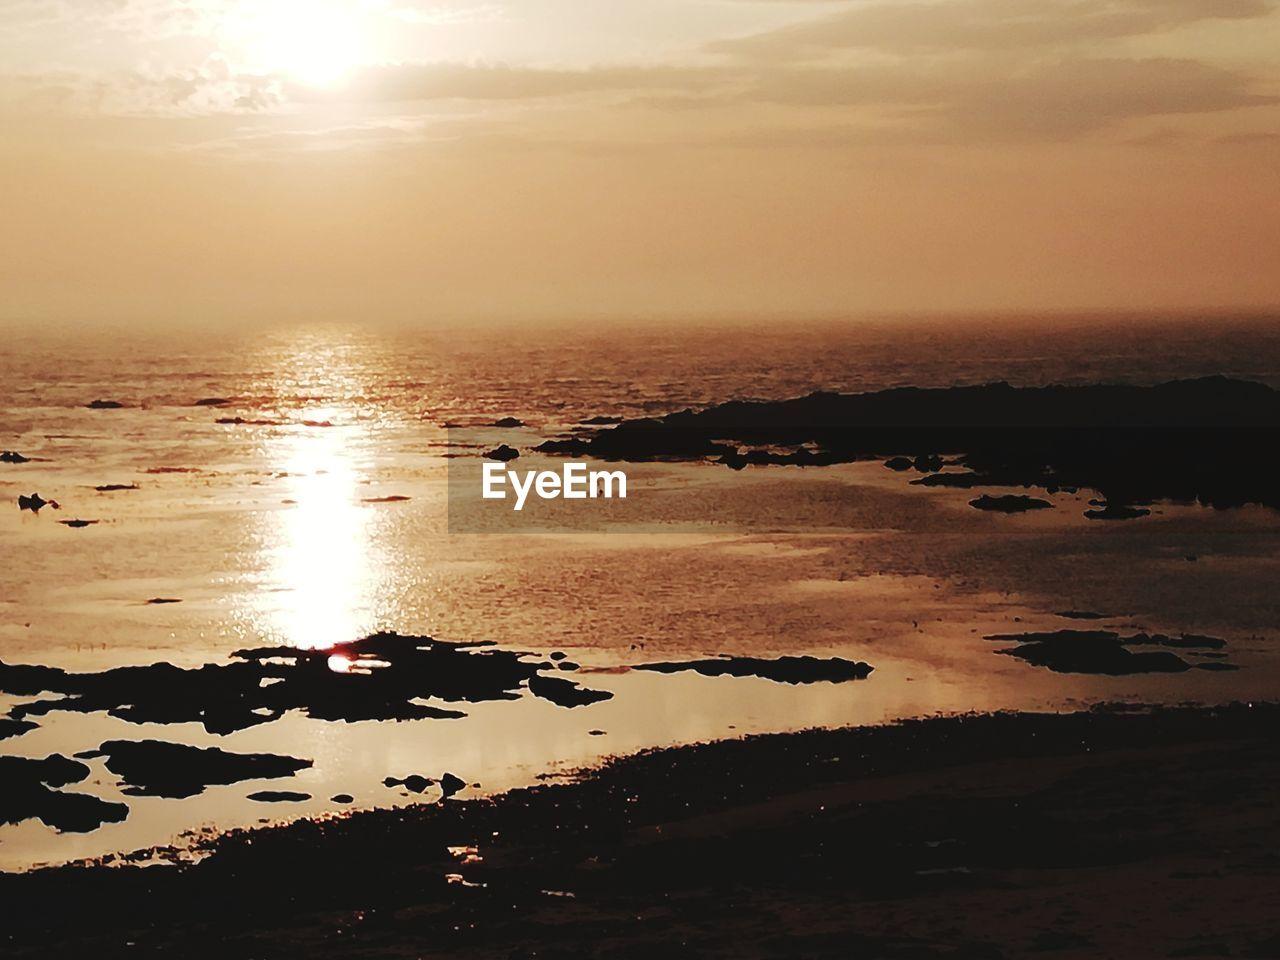 water, sky, sunset, scenics - nature, tranquility, beauty in nature, tranquil scene, sea, reflection, nature, beach, cloud - sky, land, sunlight, no people, idyllic, sun, orange color, non-urban scene, outdoors